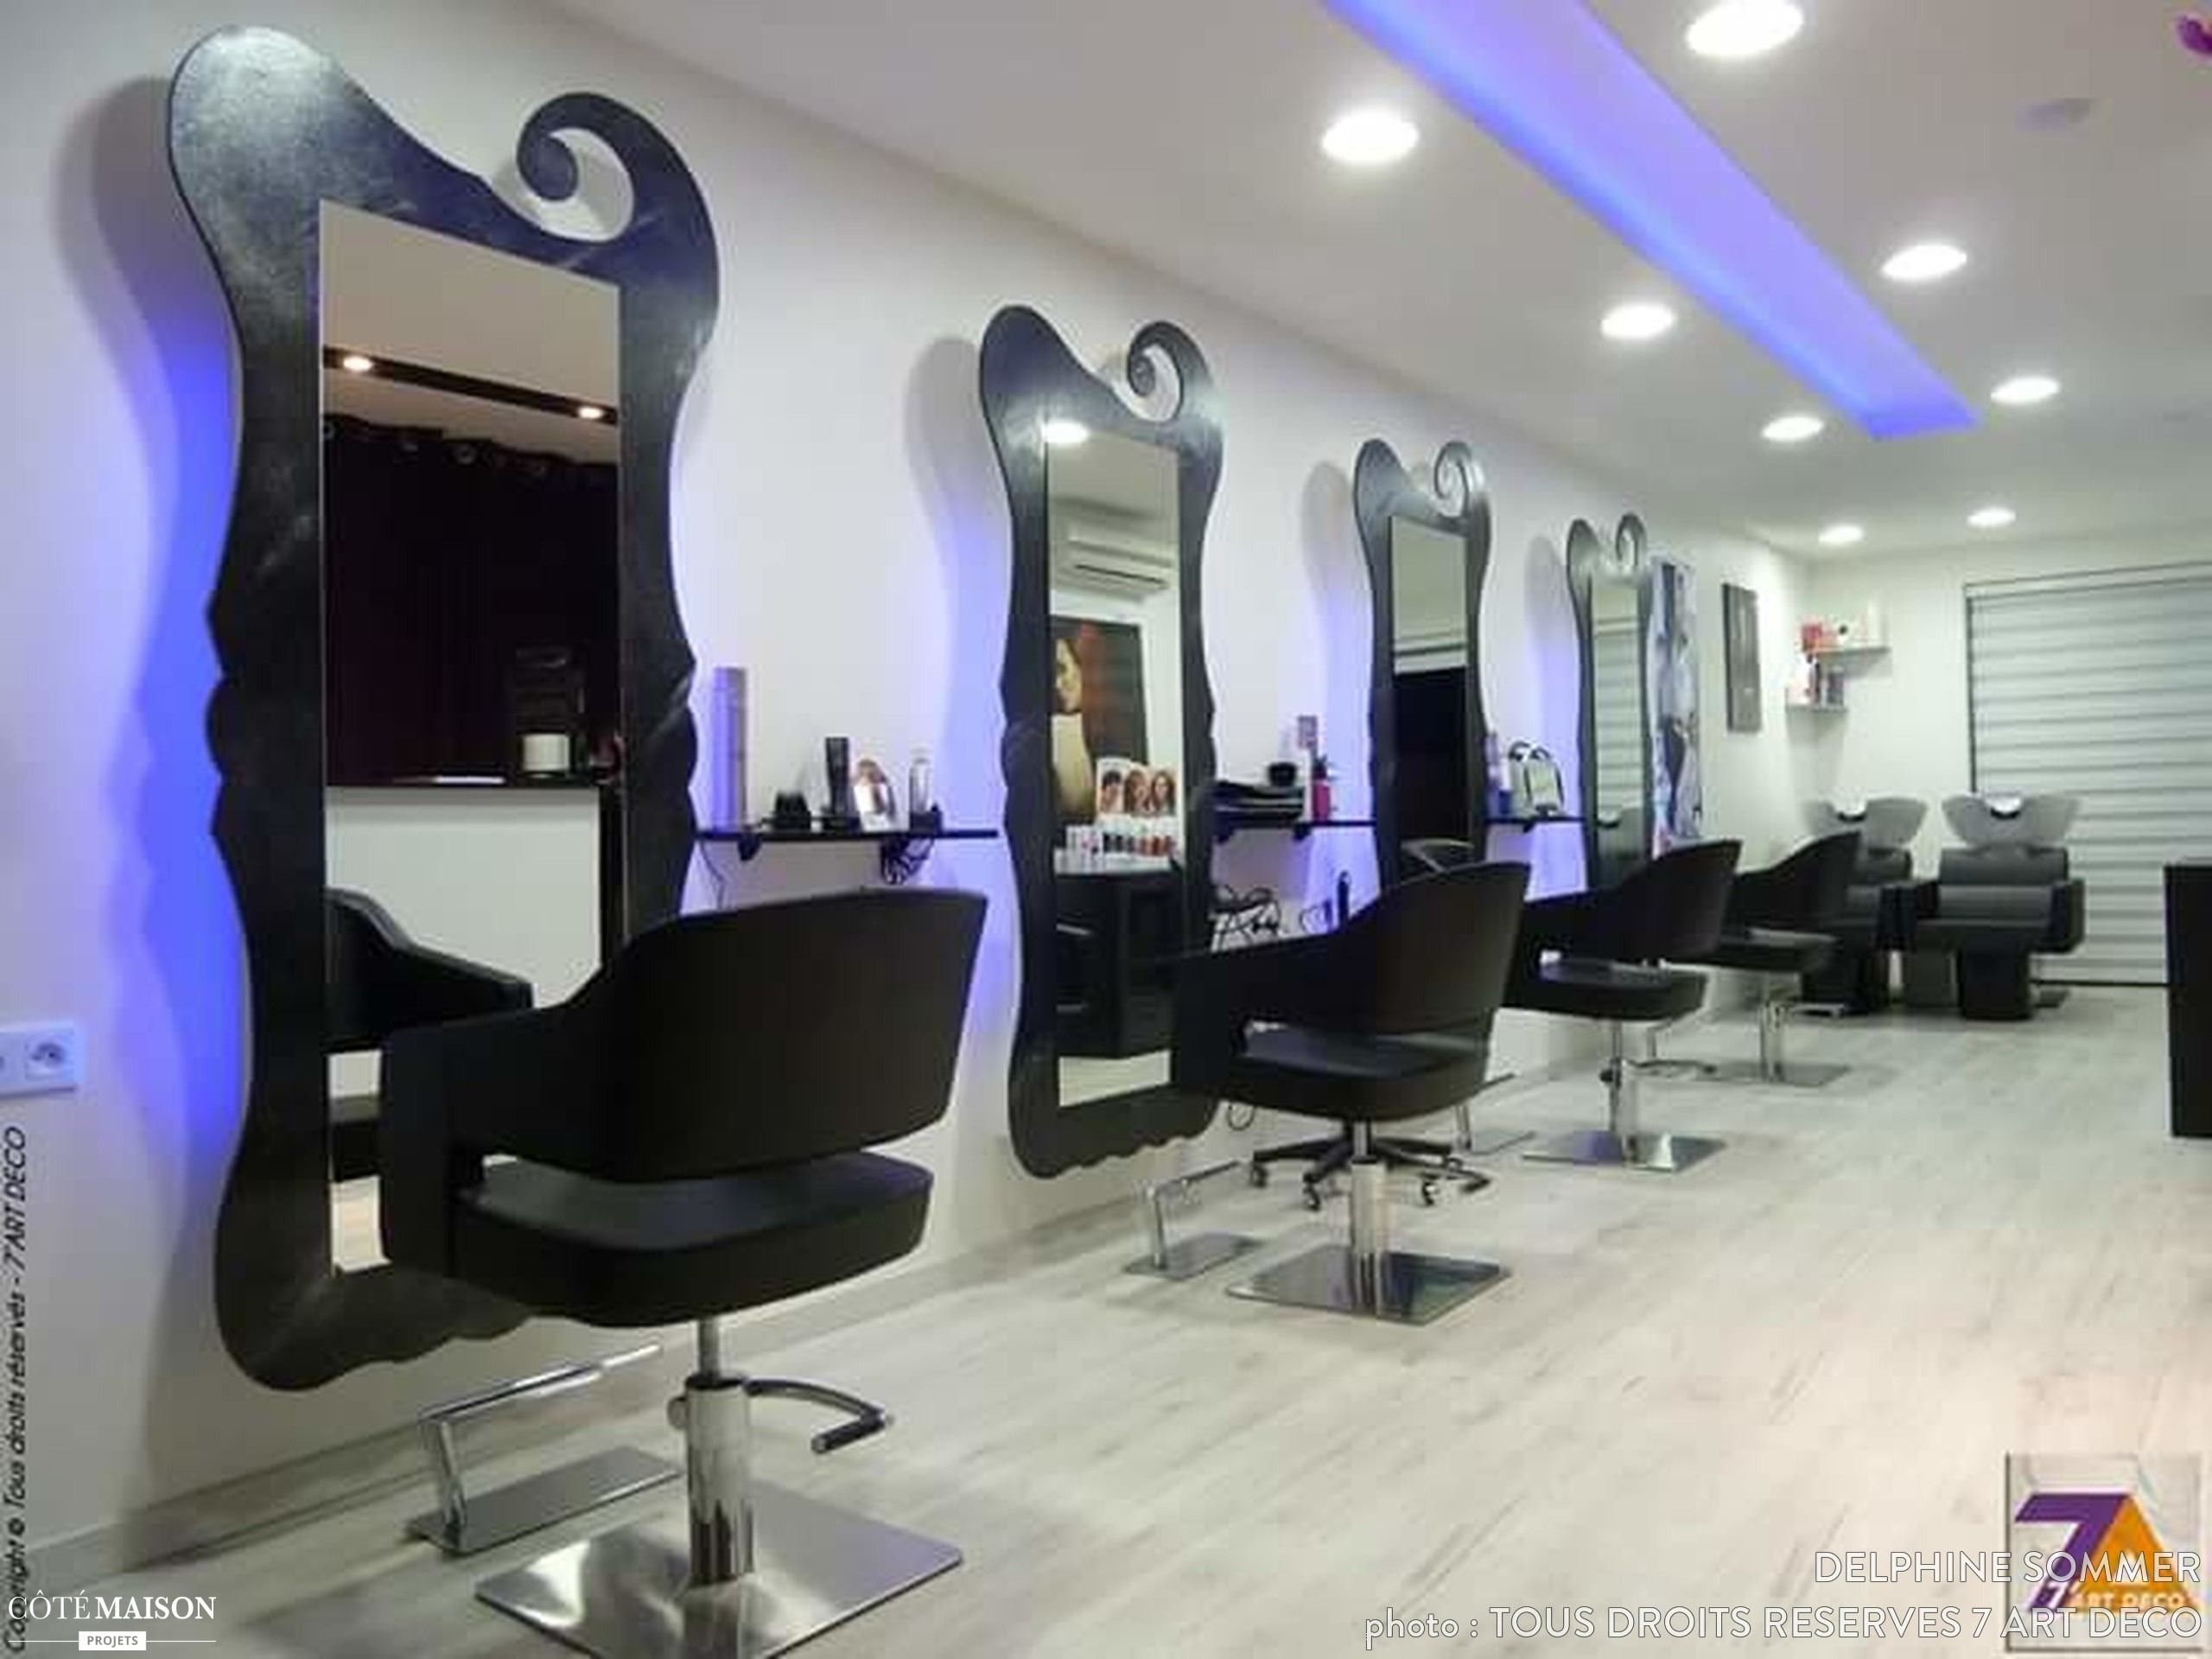 19 Decoration Salon De Coiffure 197  Home, Home decor, Design